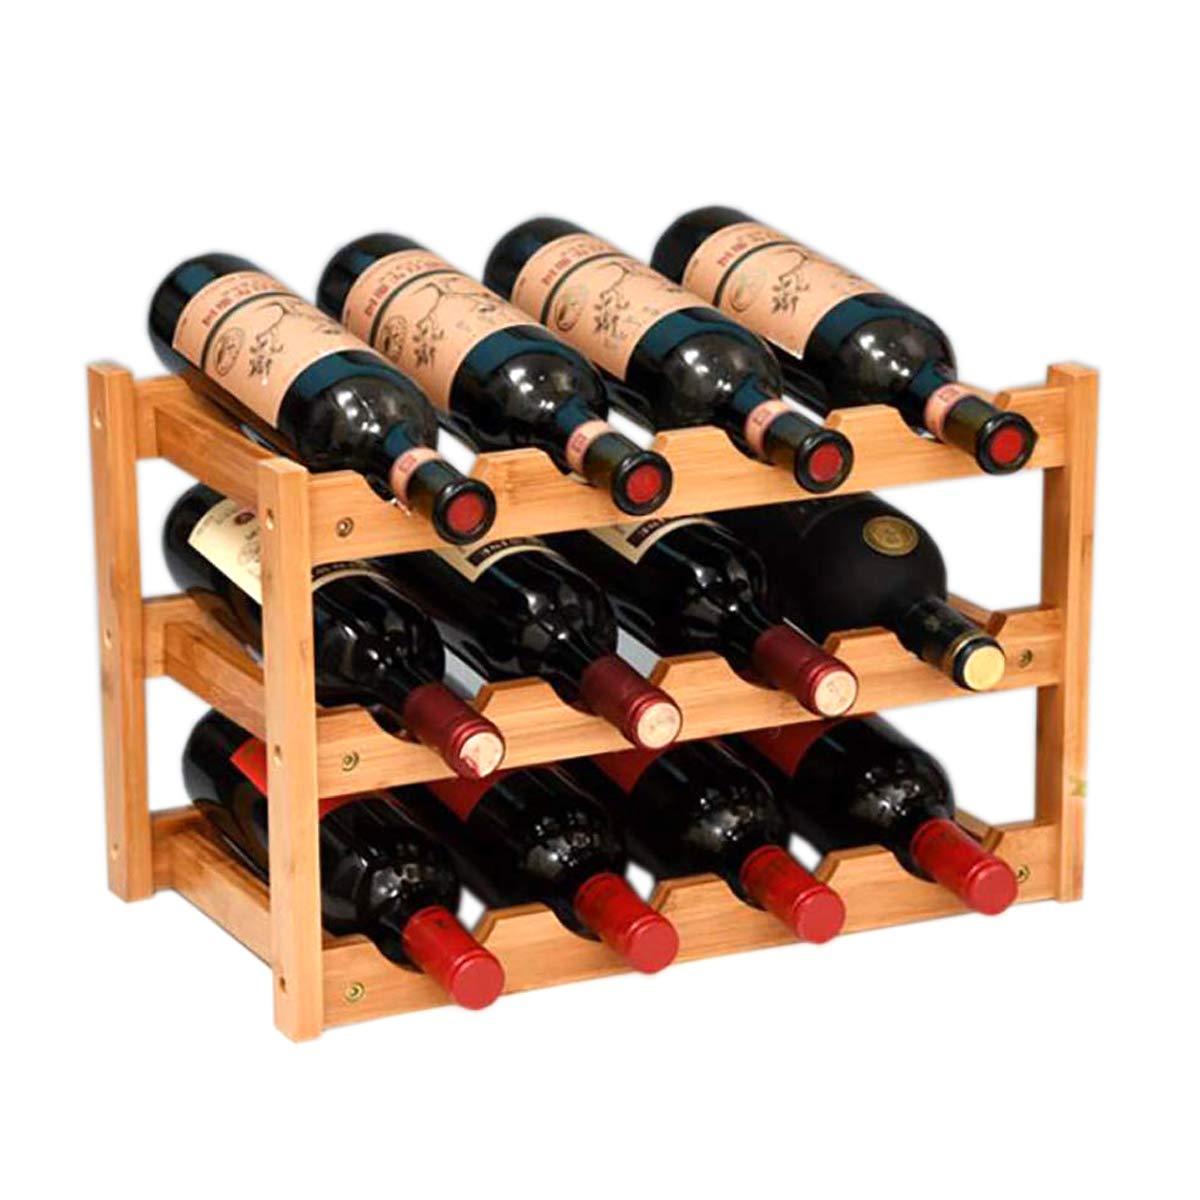 Riipoo 8-Bottle Wine Rack Free Standing and Countertop Stackable Wine Storage Shelf 2-Tier Nature Bamboo Wine Display Rack 8-Bottle